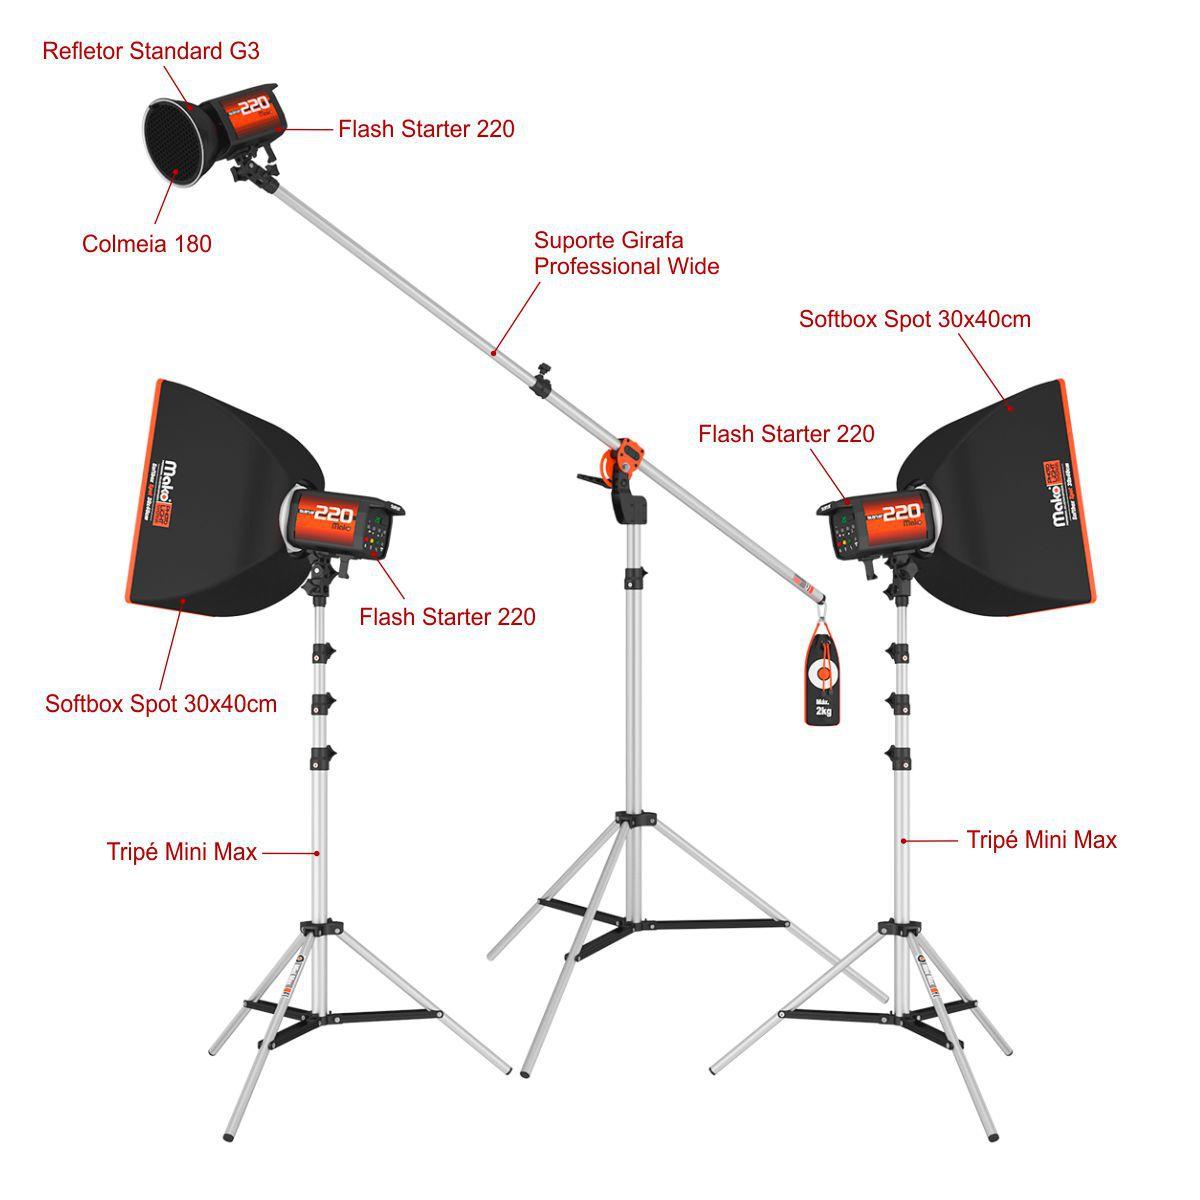 Professional Starter 5 - Digital Bivolt